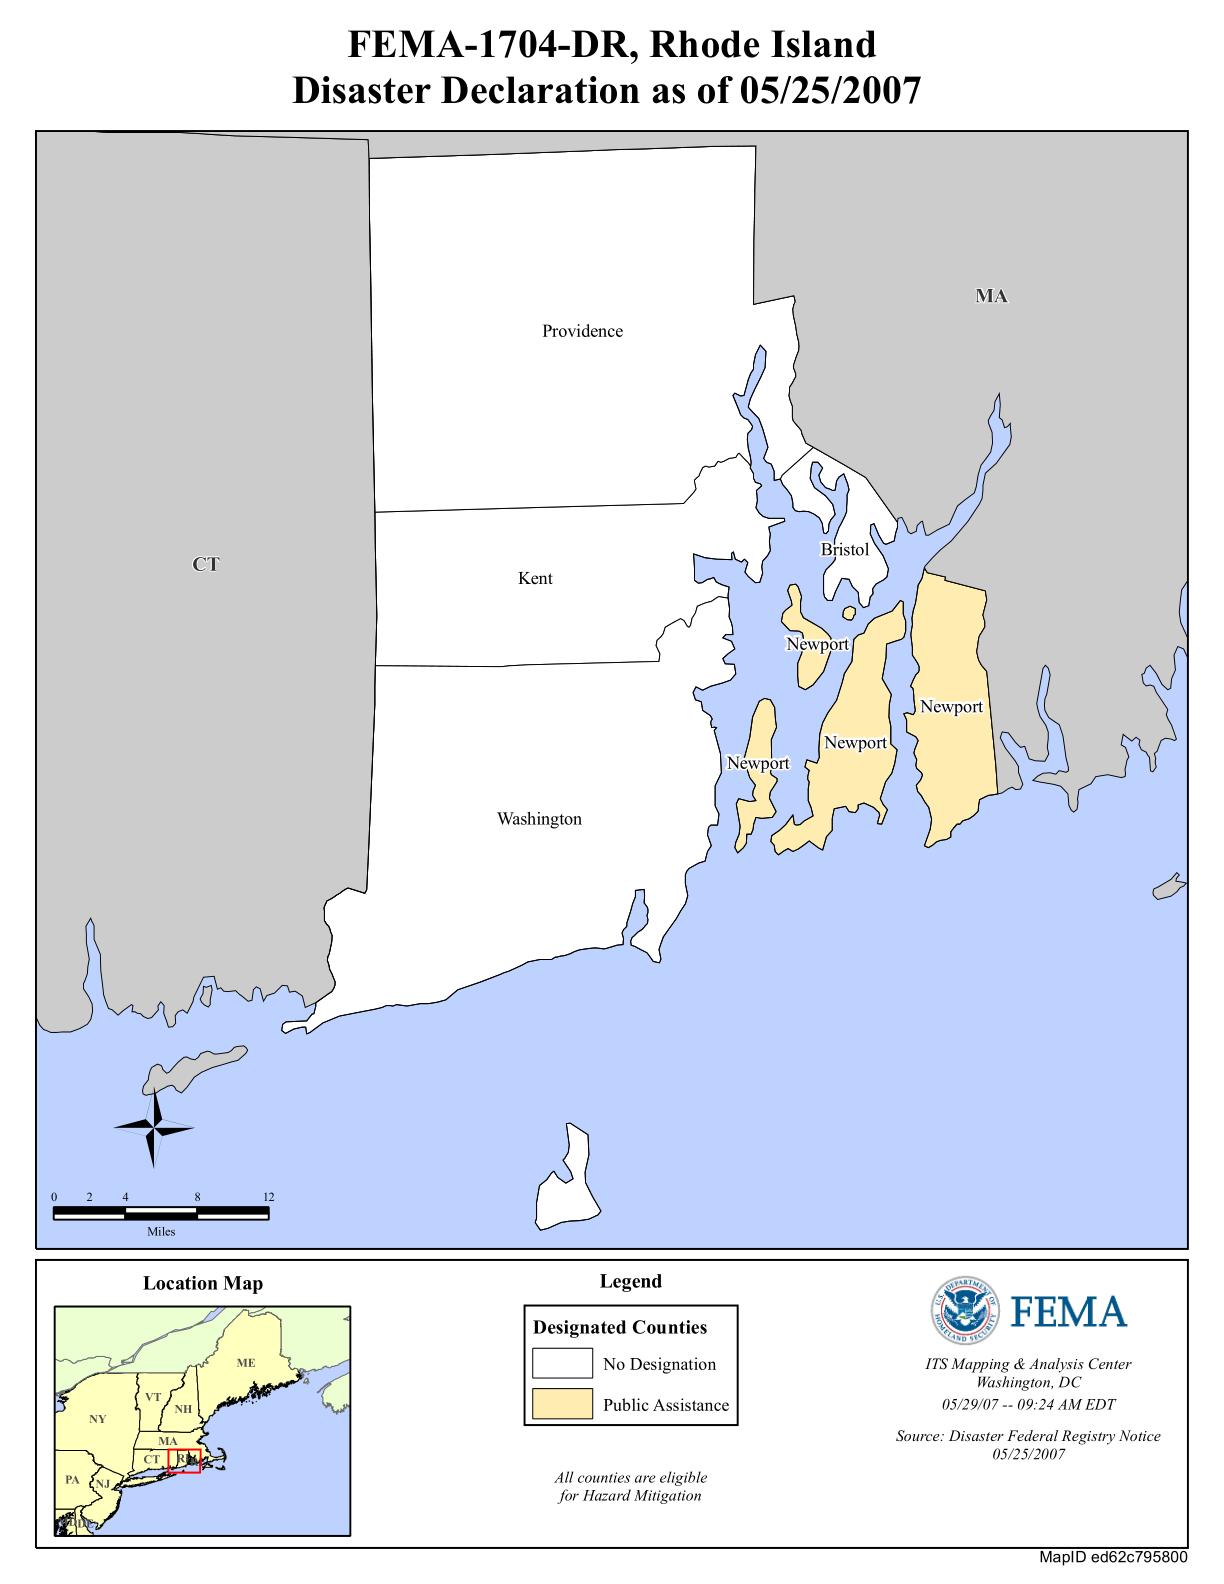 rhode island flood maps Rhode Island Severe Storms And Inland And Coastal Flooding Dr rhode island flood maps